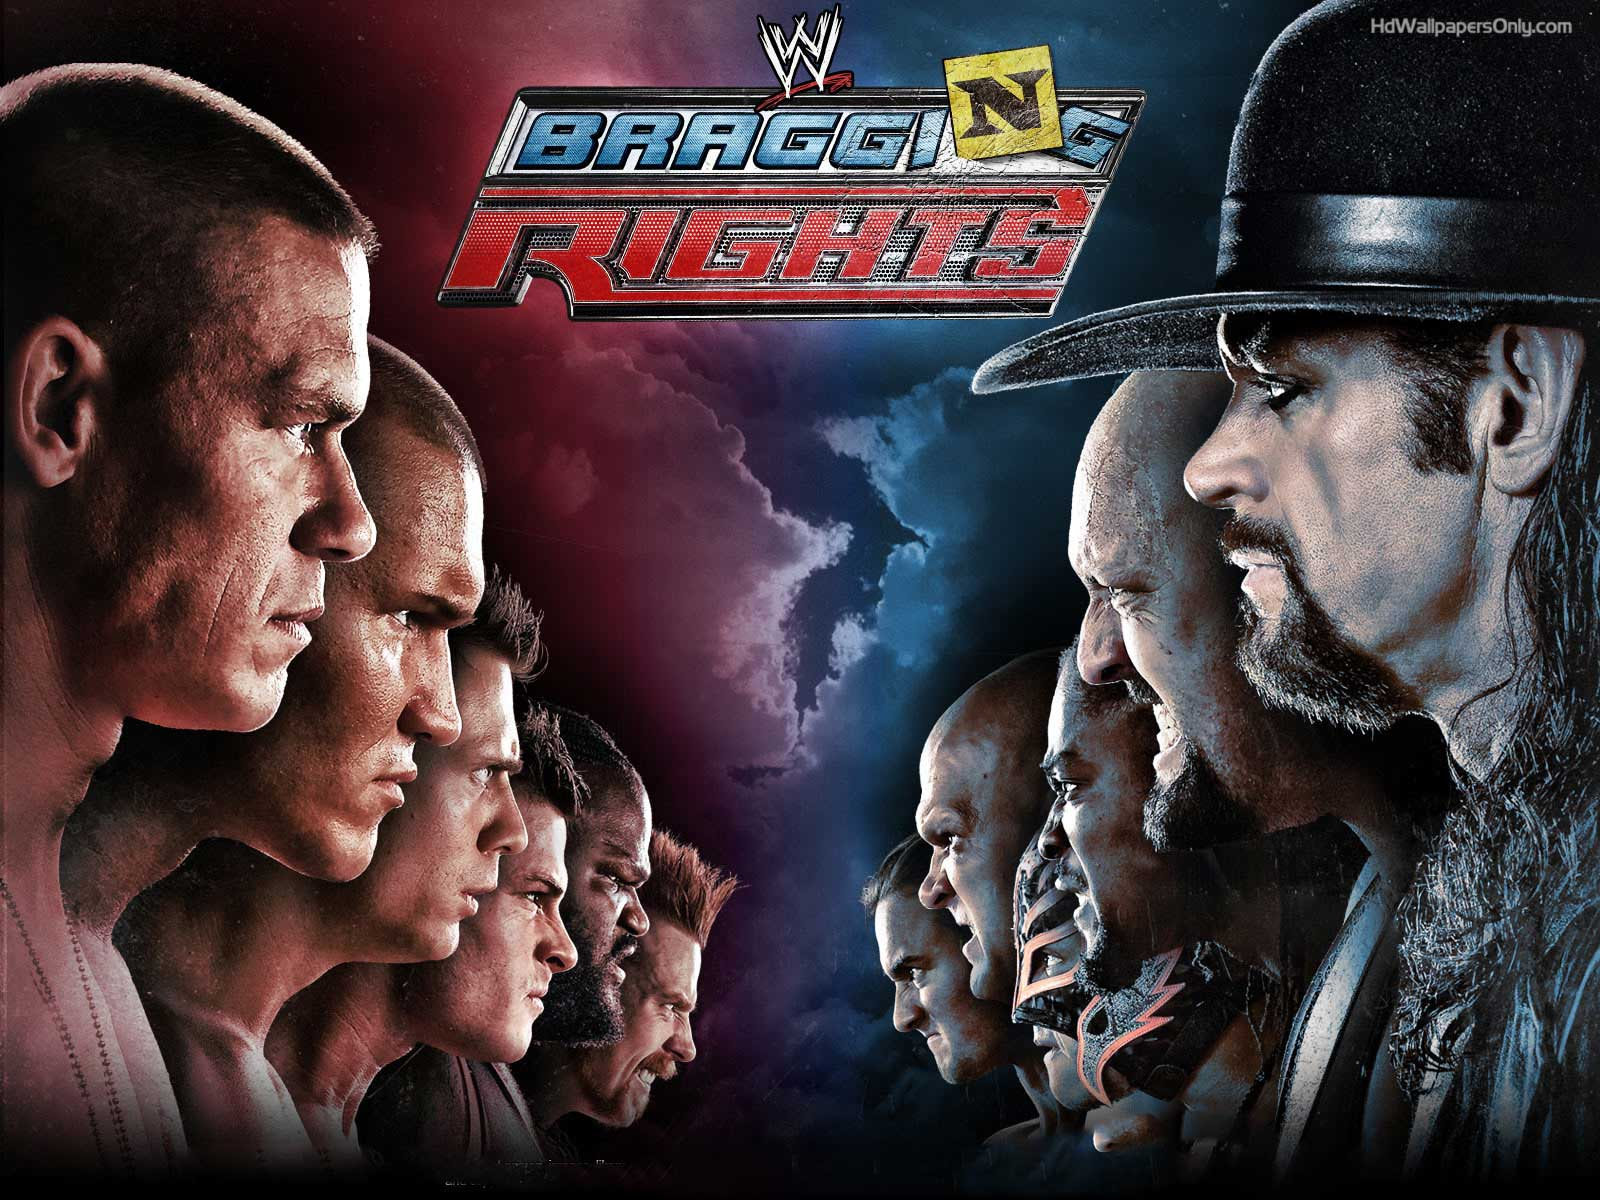 Beautiful WWE Wallpaper